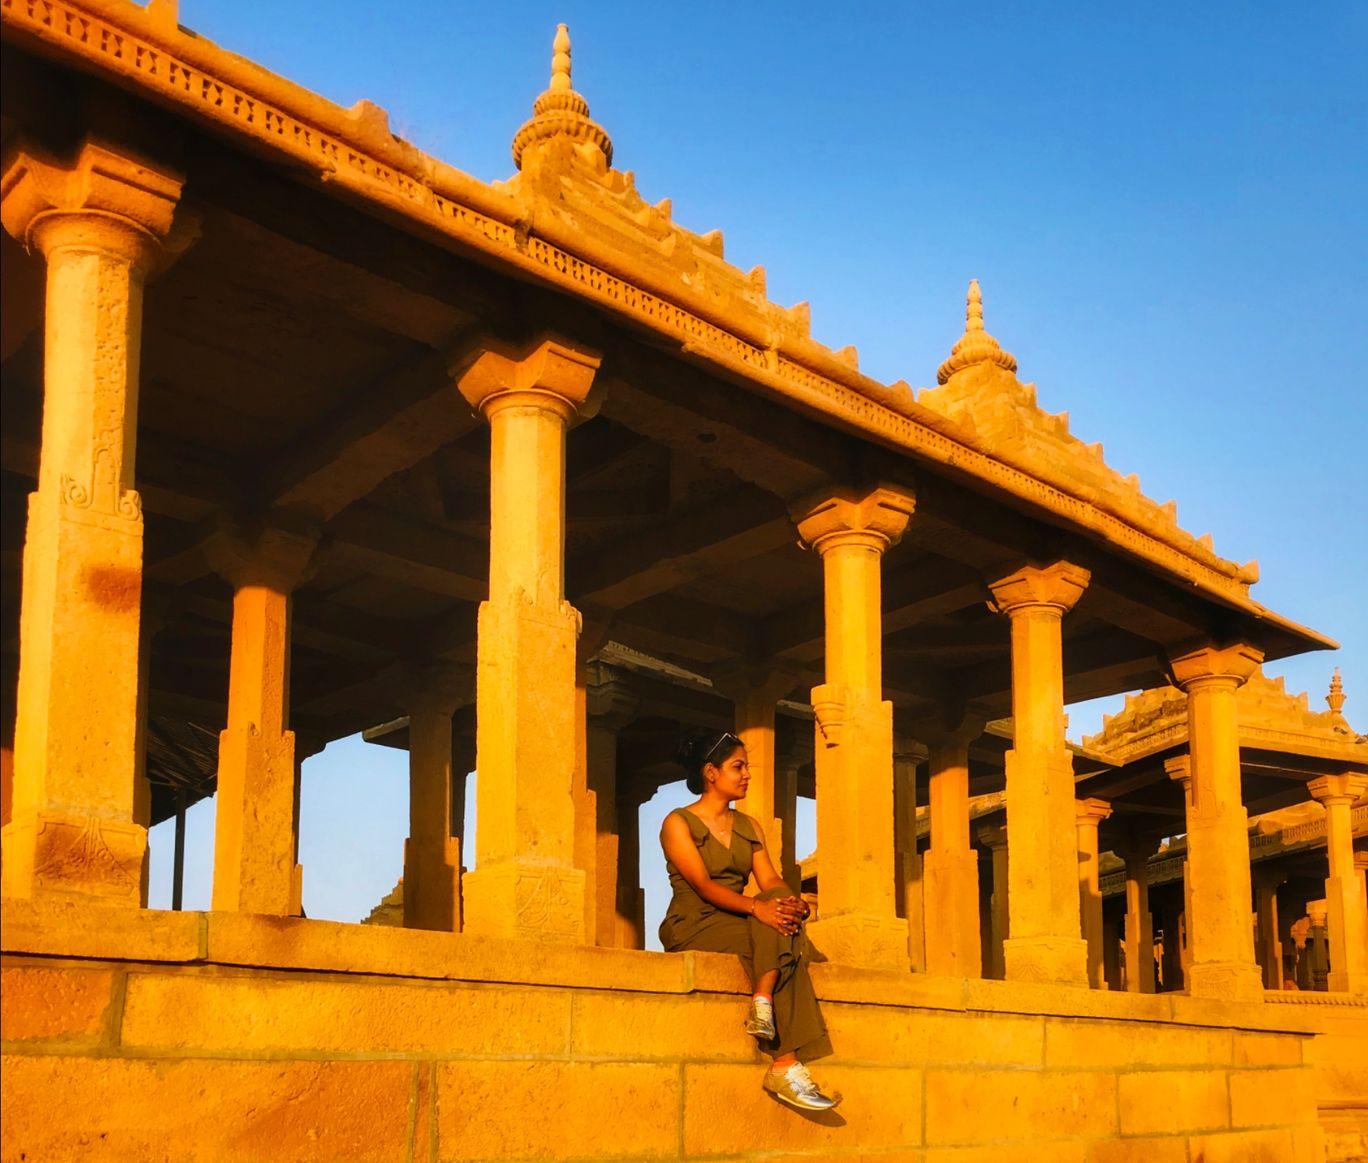 Photo of Rajasthan By Geetu Mohandas